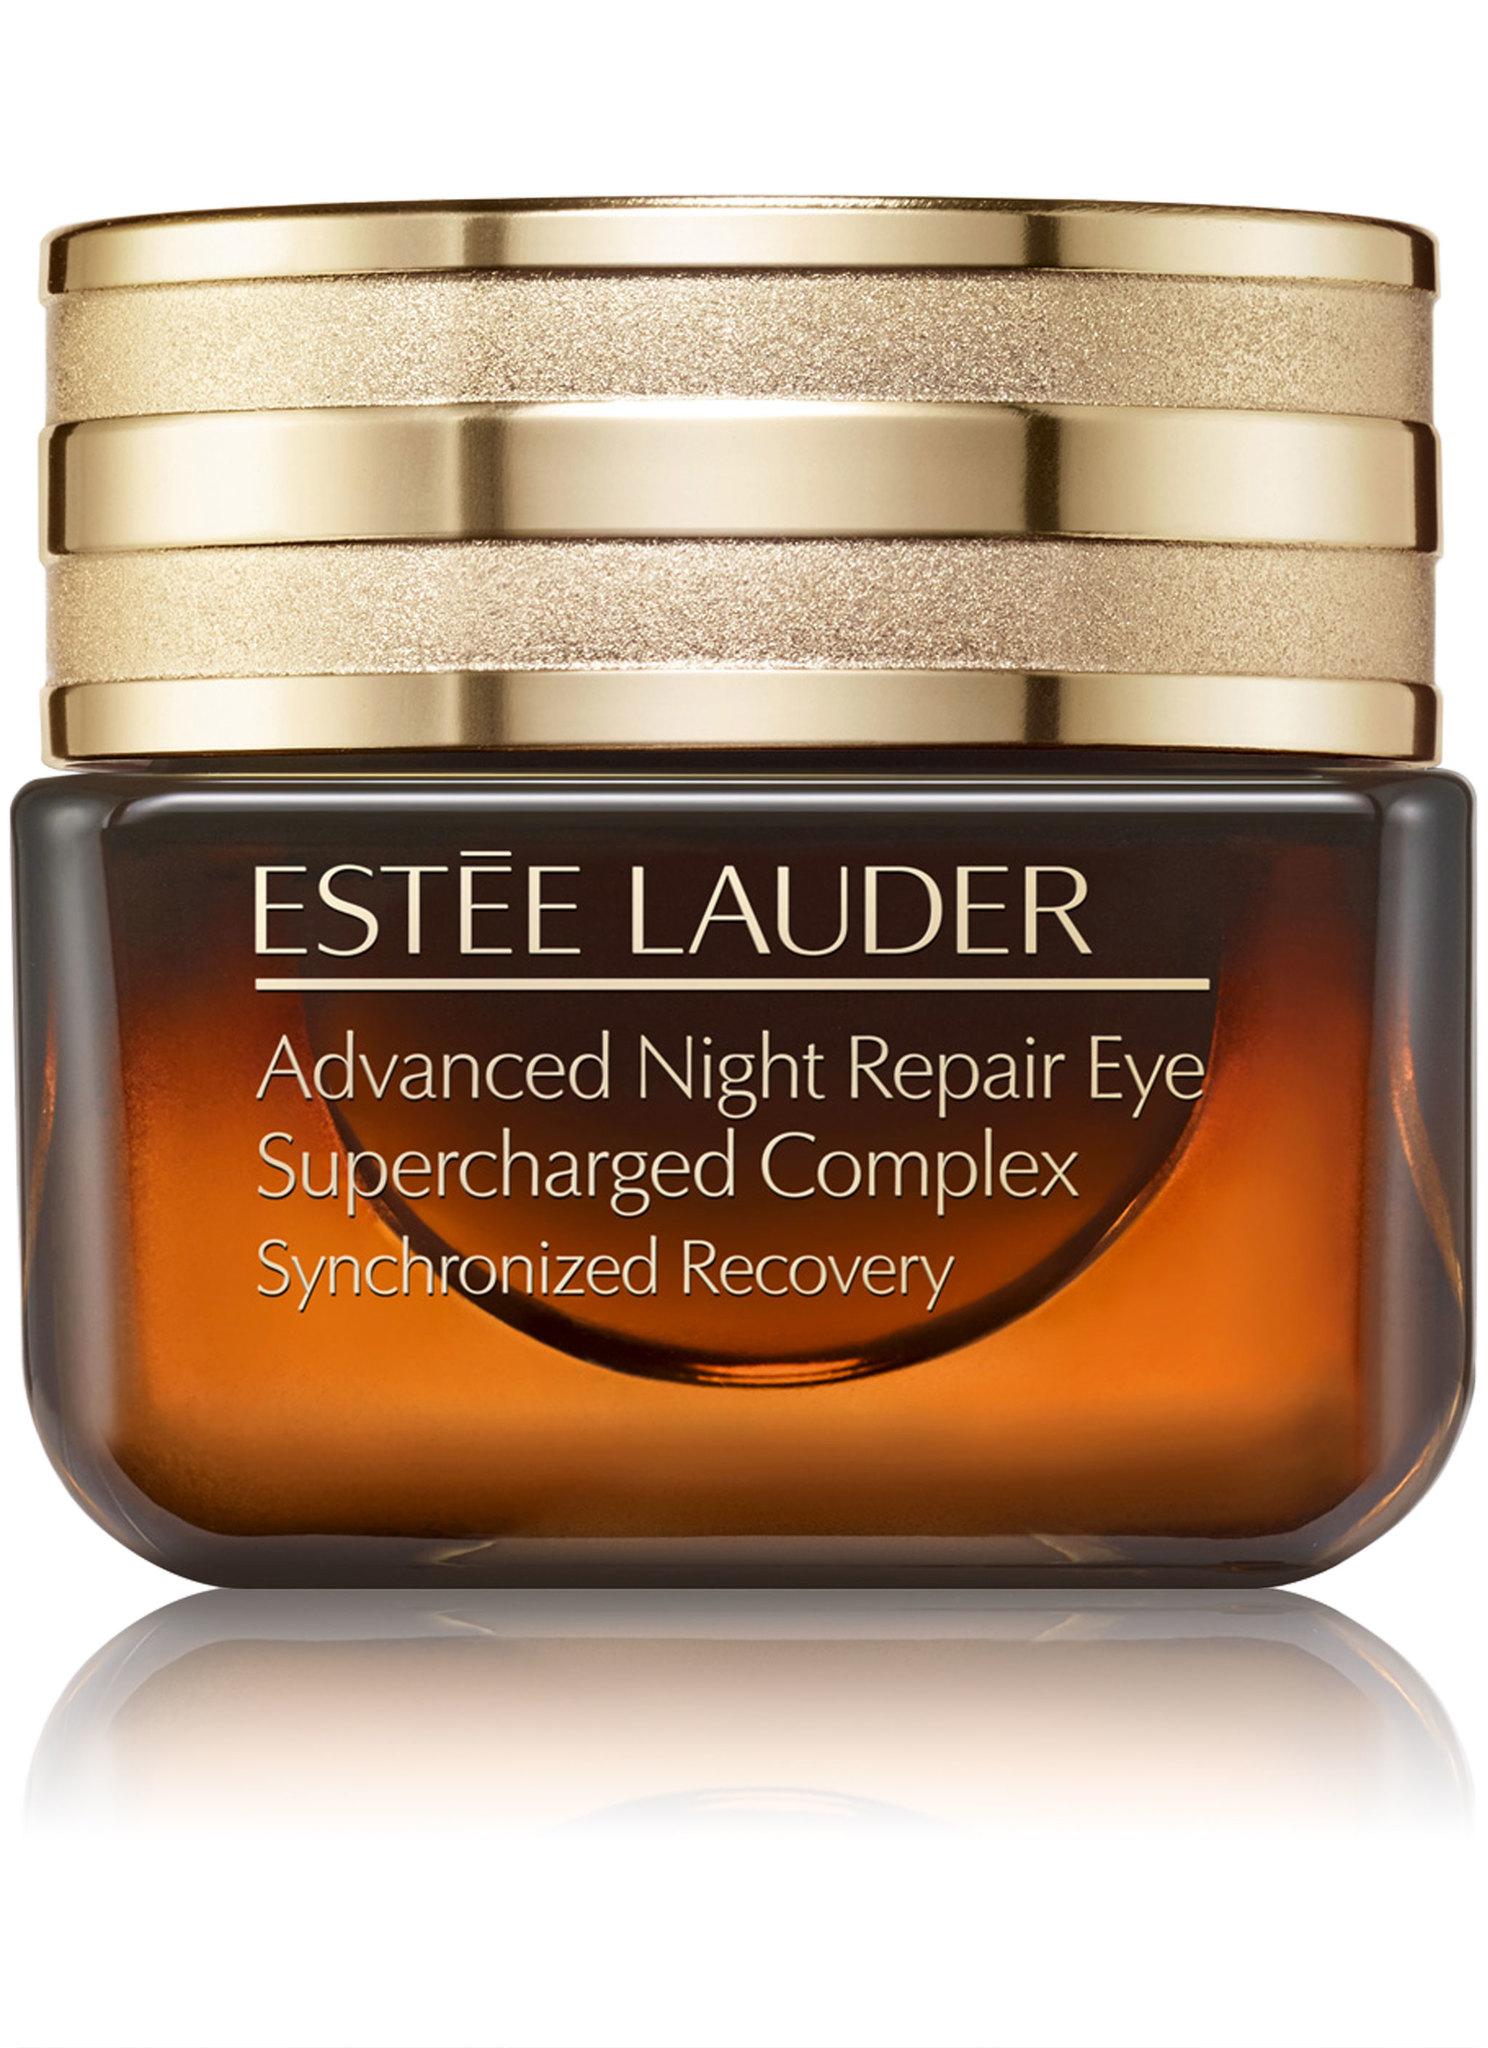 Estée Lauder Advanced Night Repair Eye, 15 ml